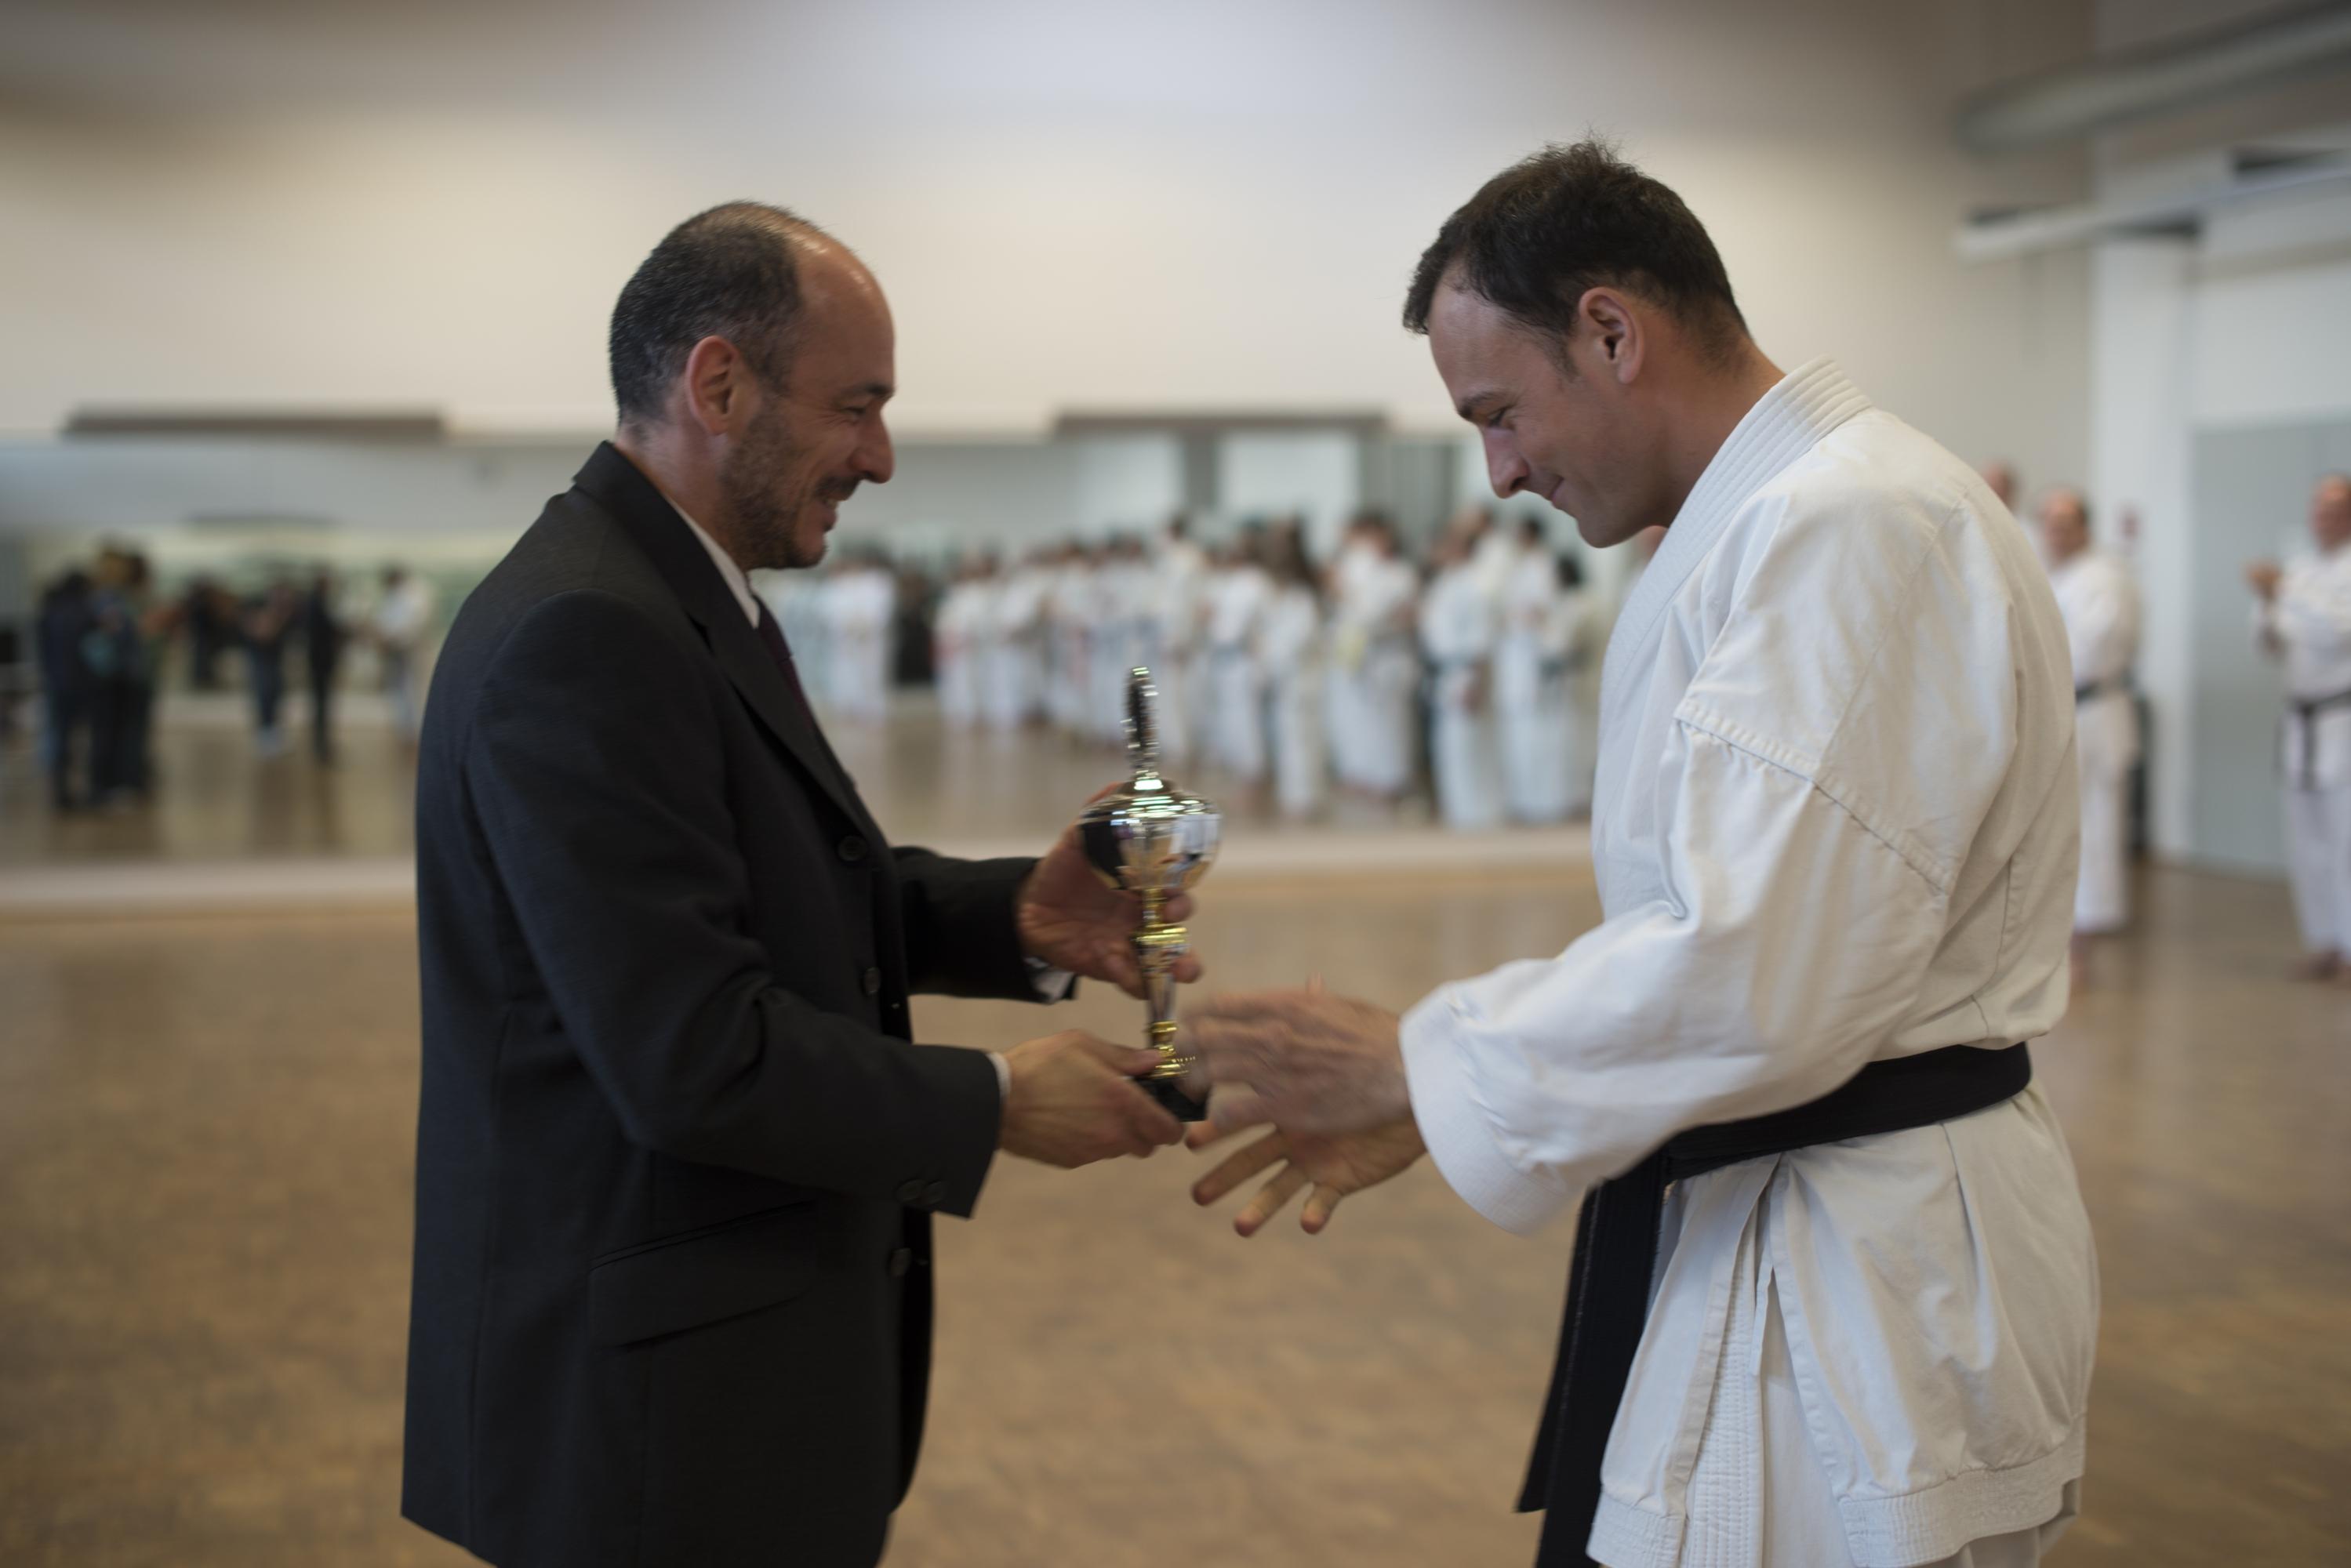 2016-04-26 Kata Turnier Kaarst 351